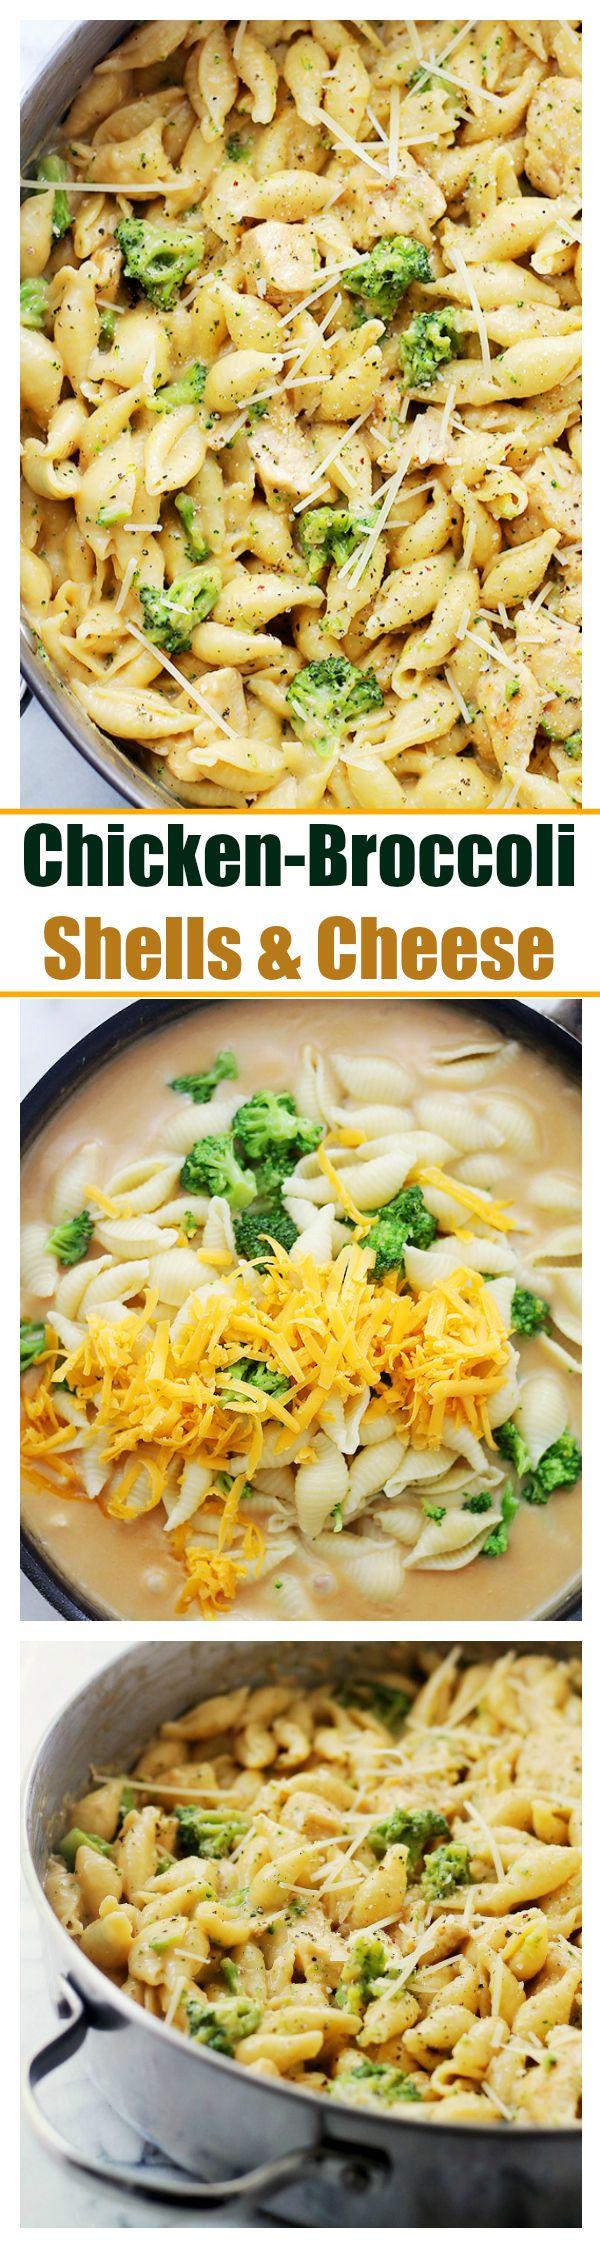 Chicken-Broccoli Shells and Cheese: Homemade, lightened-up shells and cheese, tossed with chicken and broccoli florets.